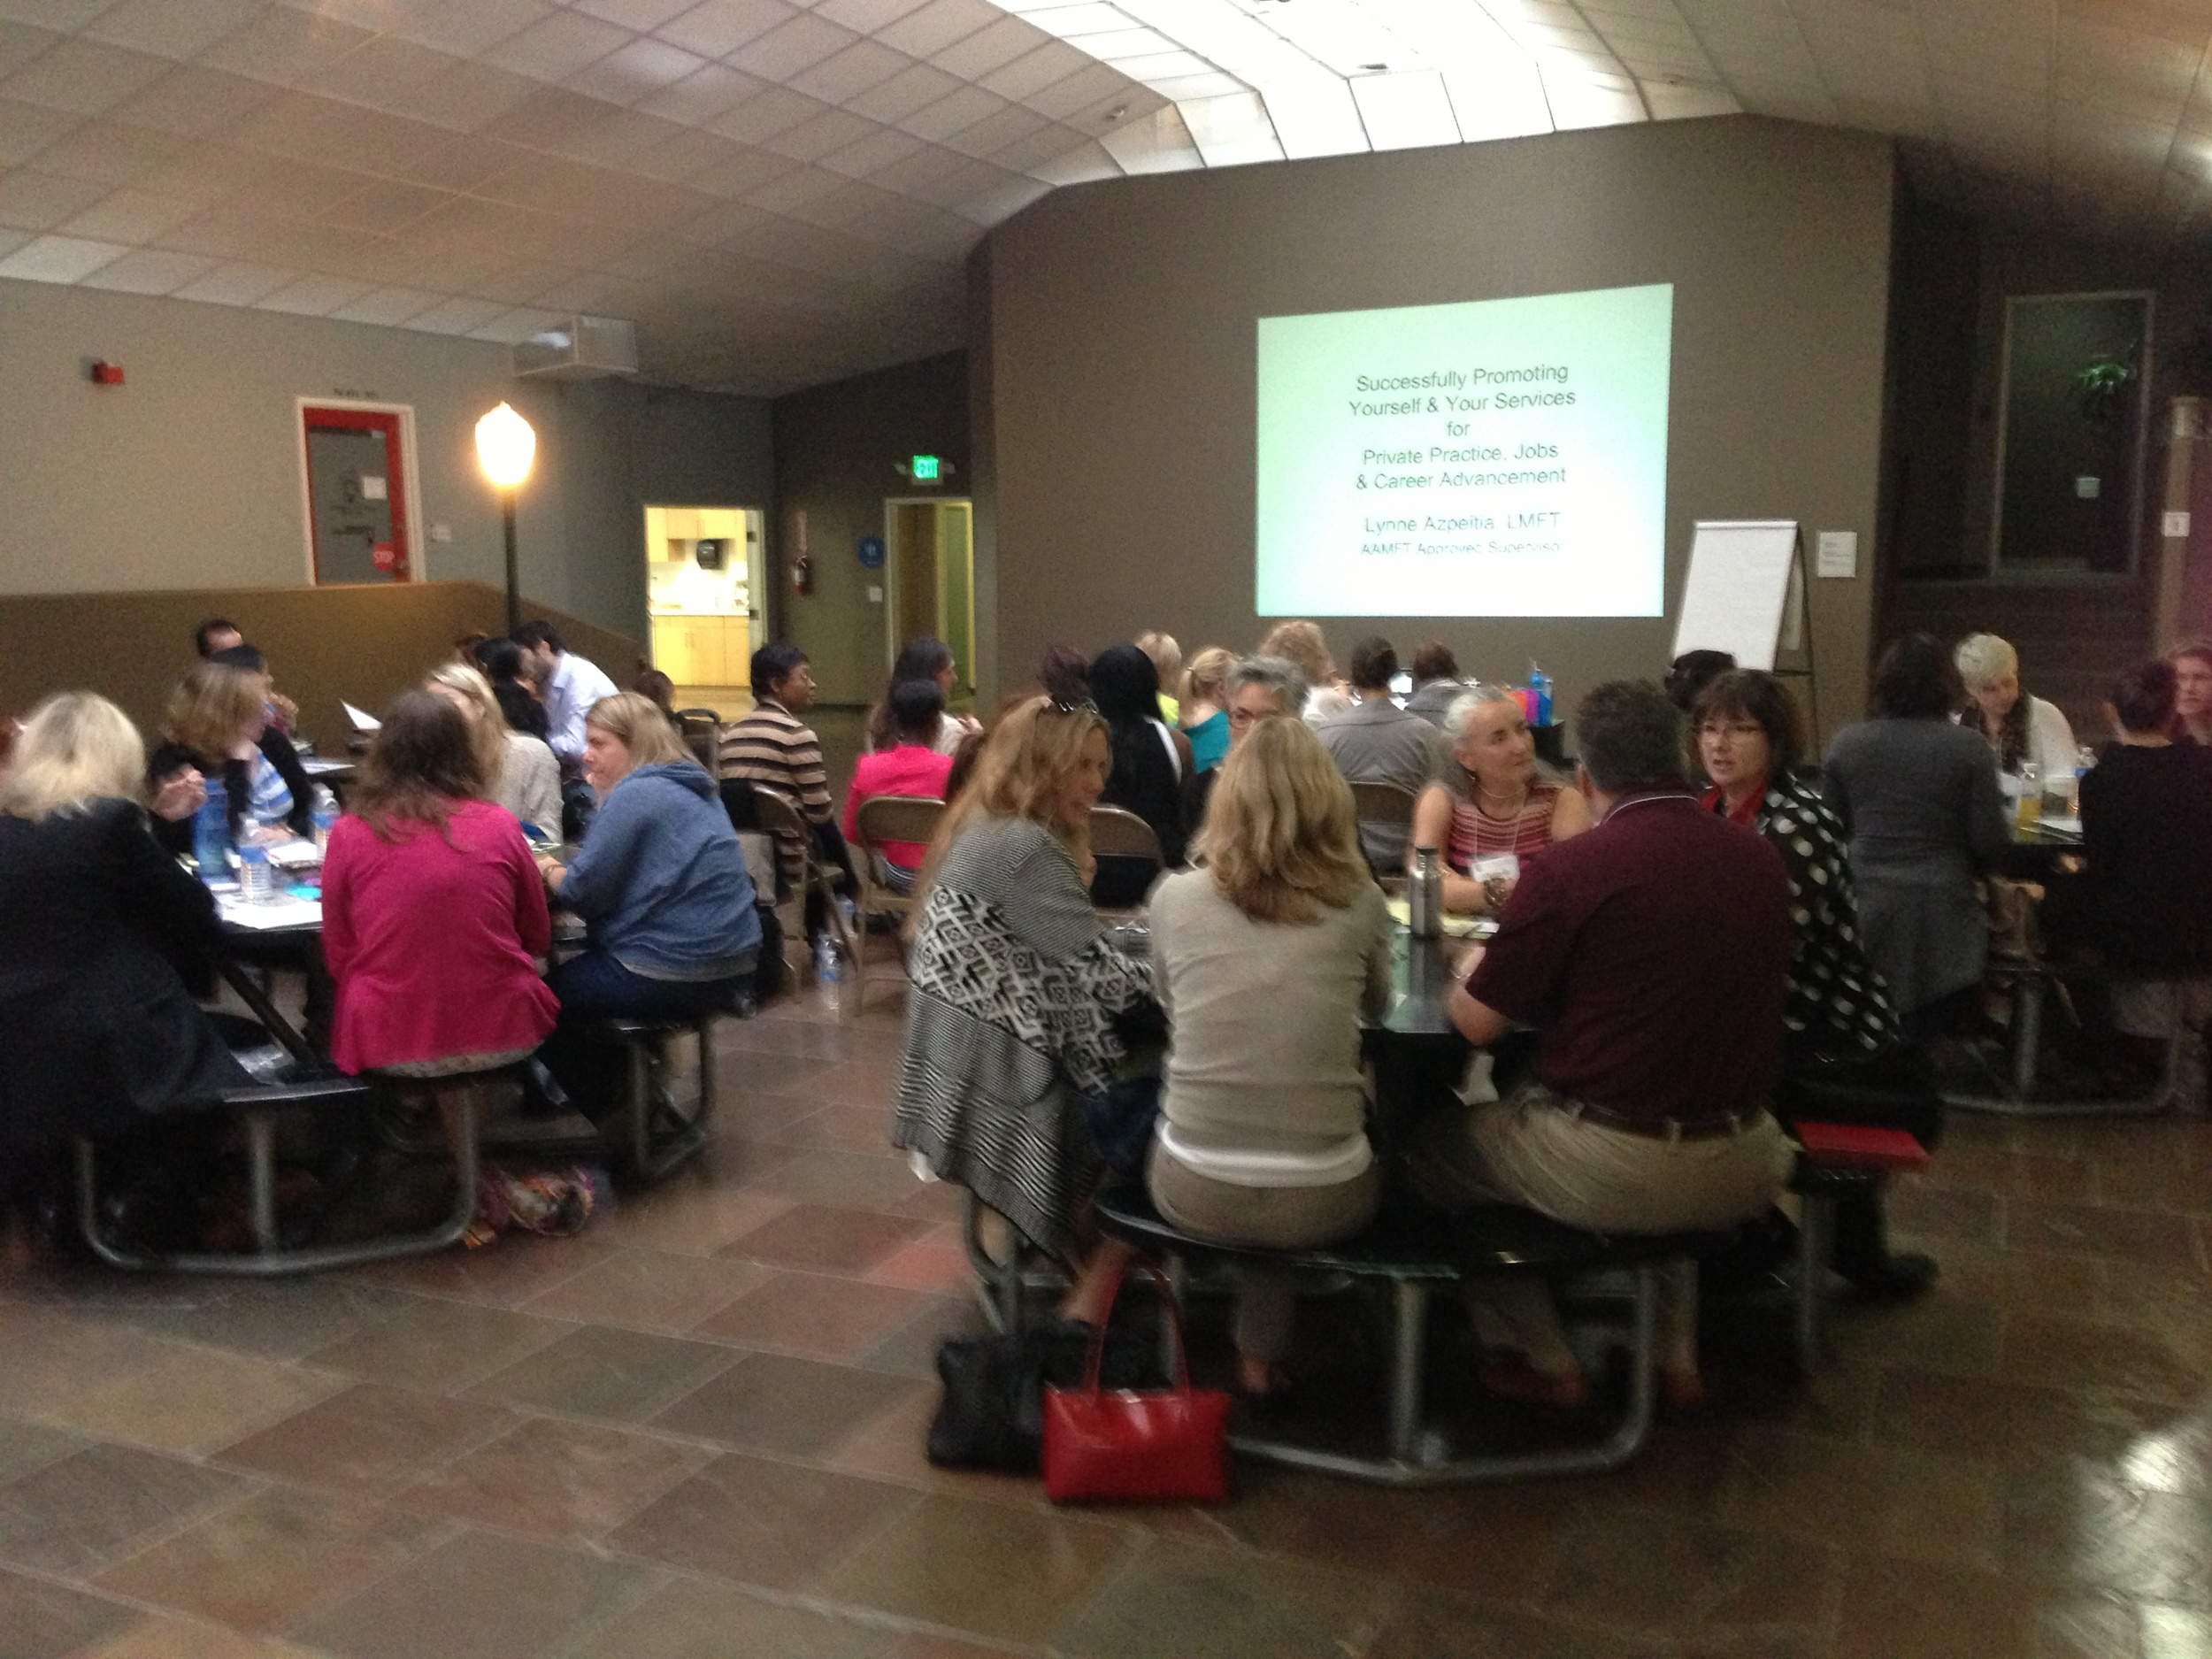 Presenting Yourself & Your Services Workshop at Nebraska Studios, Santa Monica, California Photo: Lynne Azpeitia